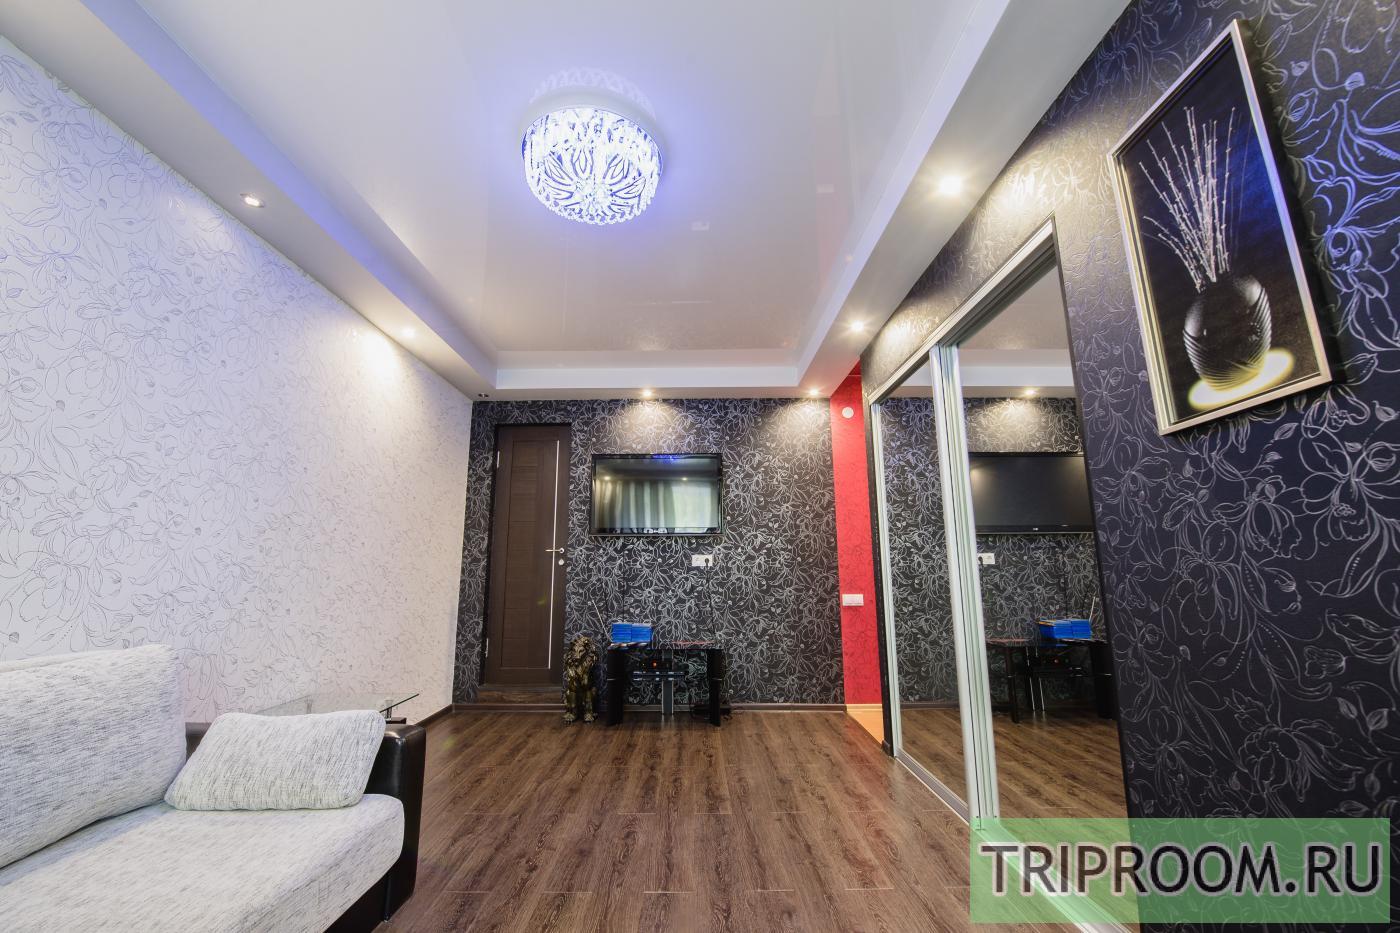 1-комнатная квартира посуточно (вариант № 14780), ул. Шевченко улица, фото № 3